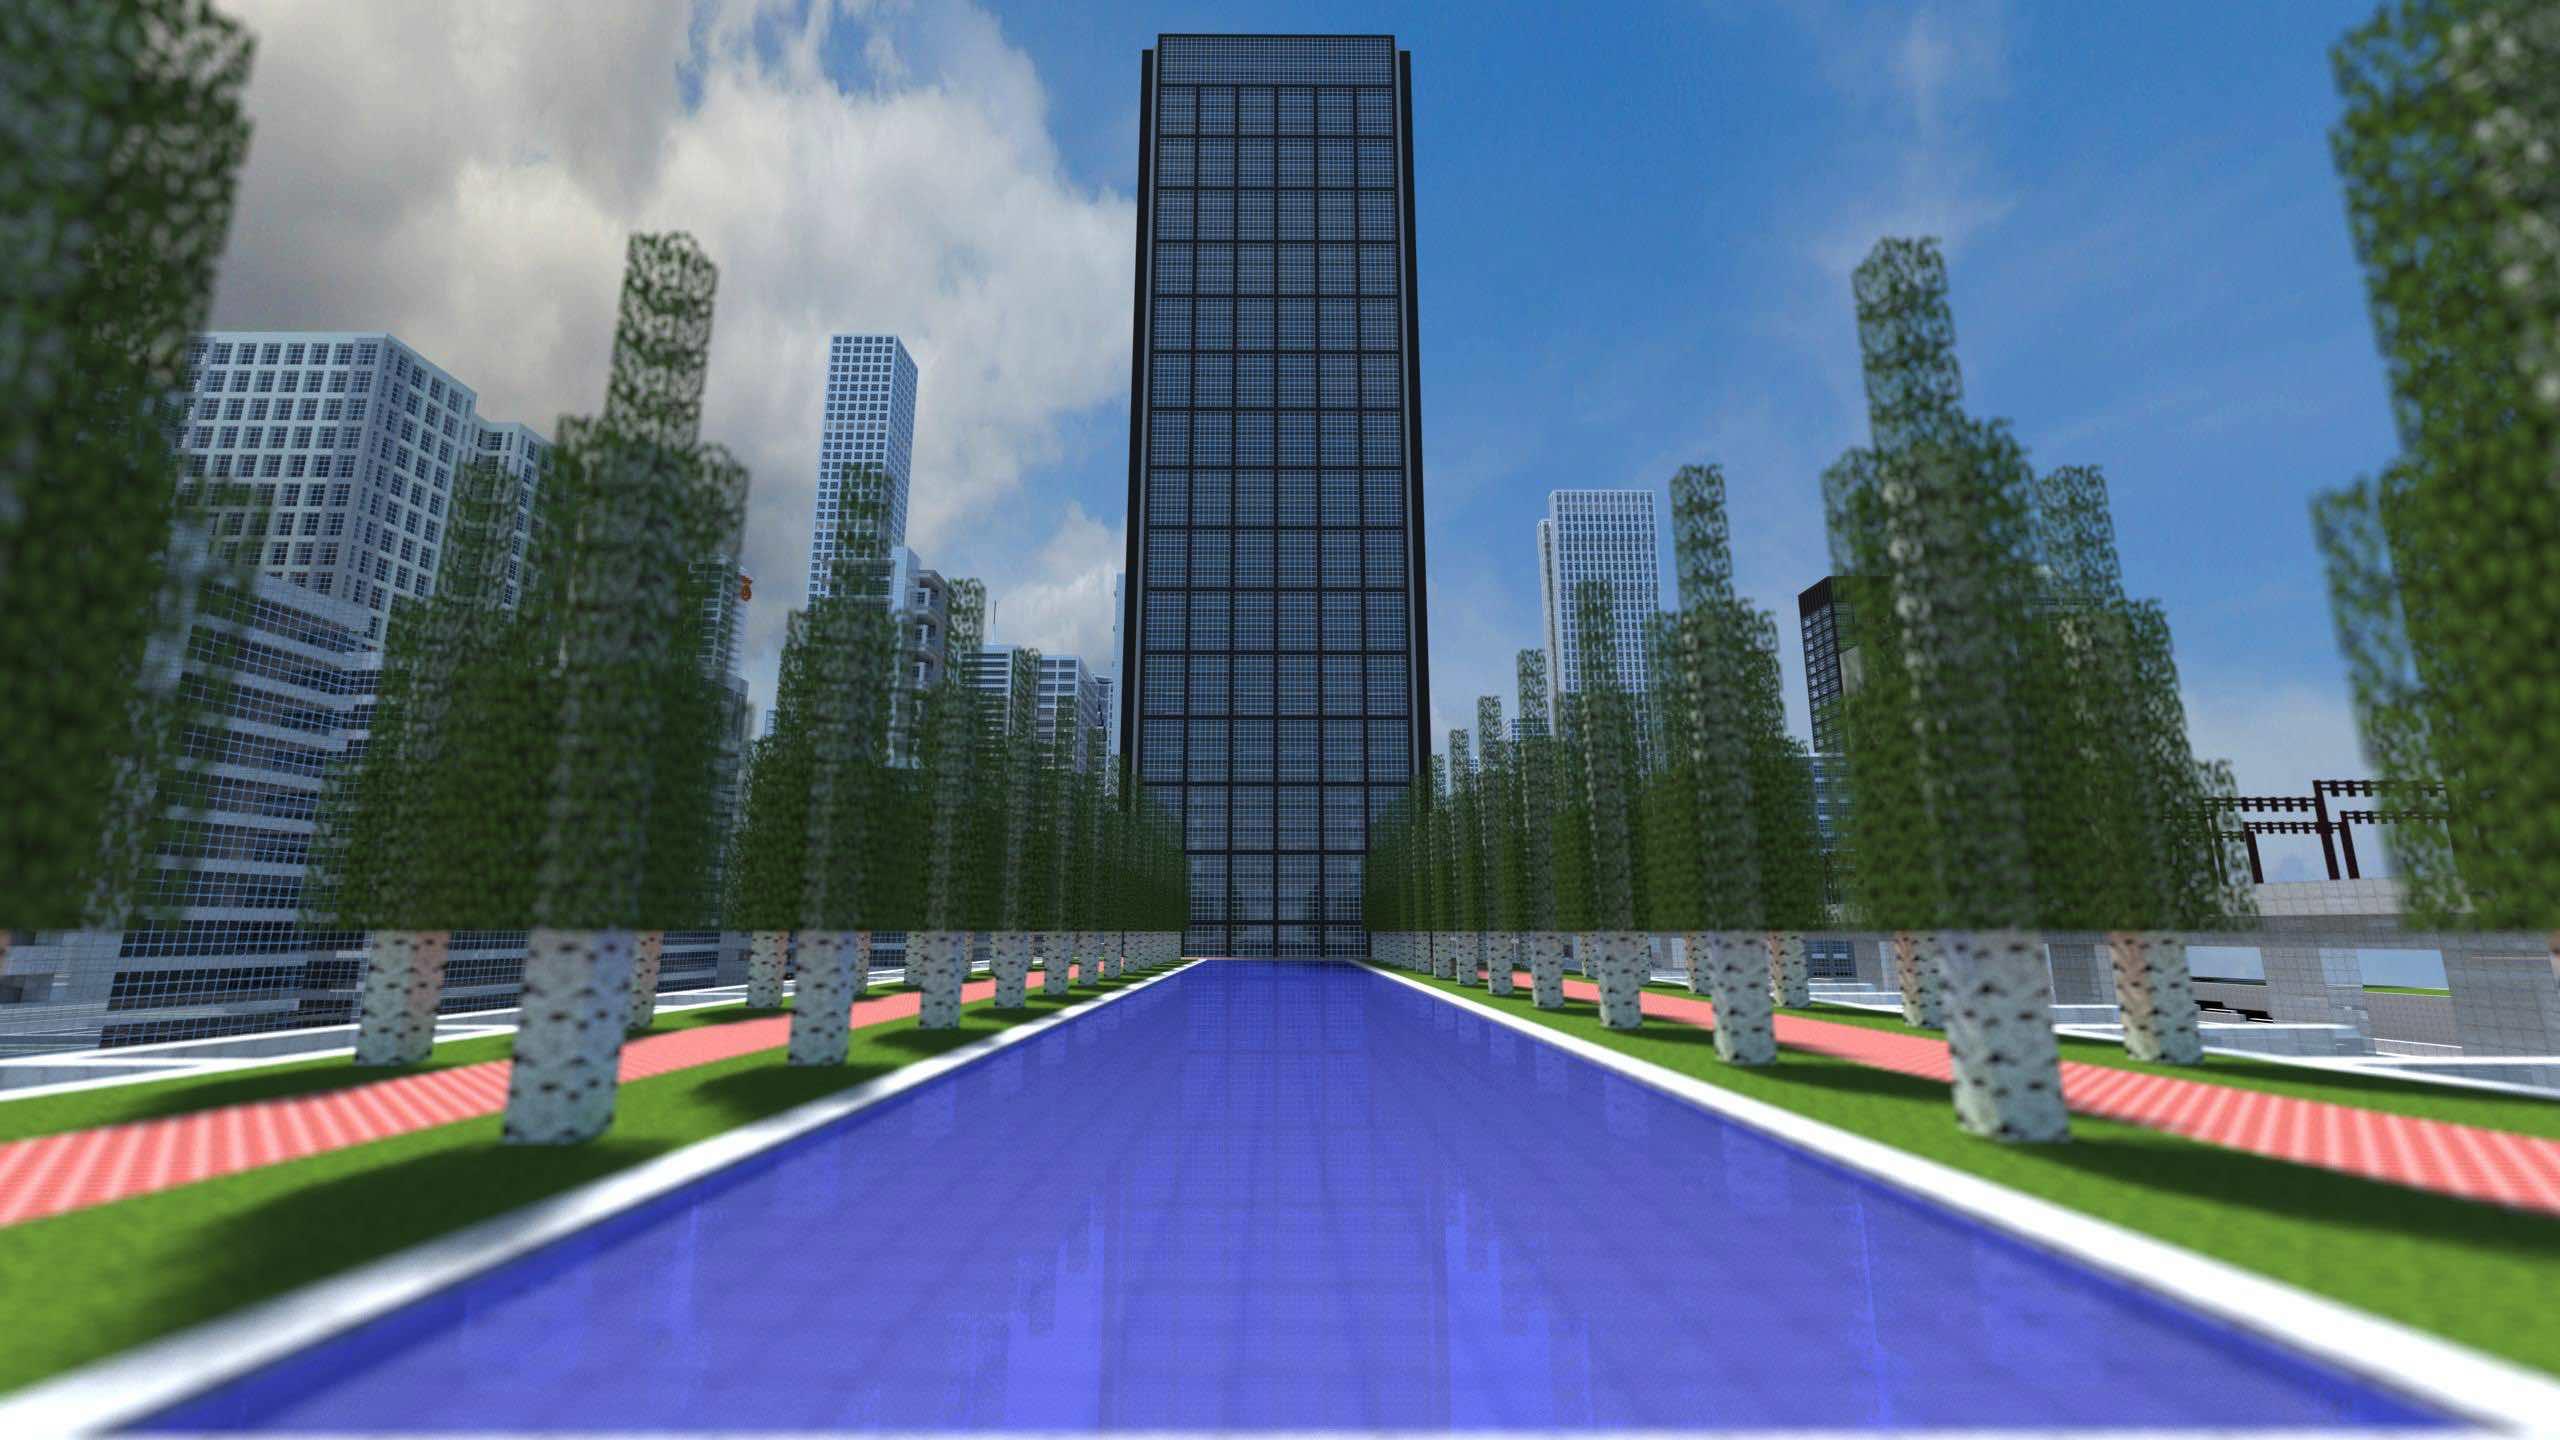 minecraft-city-plaza